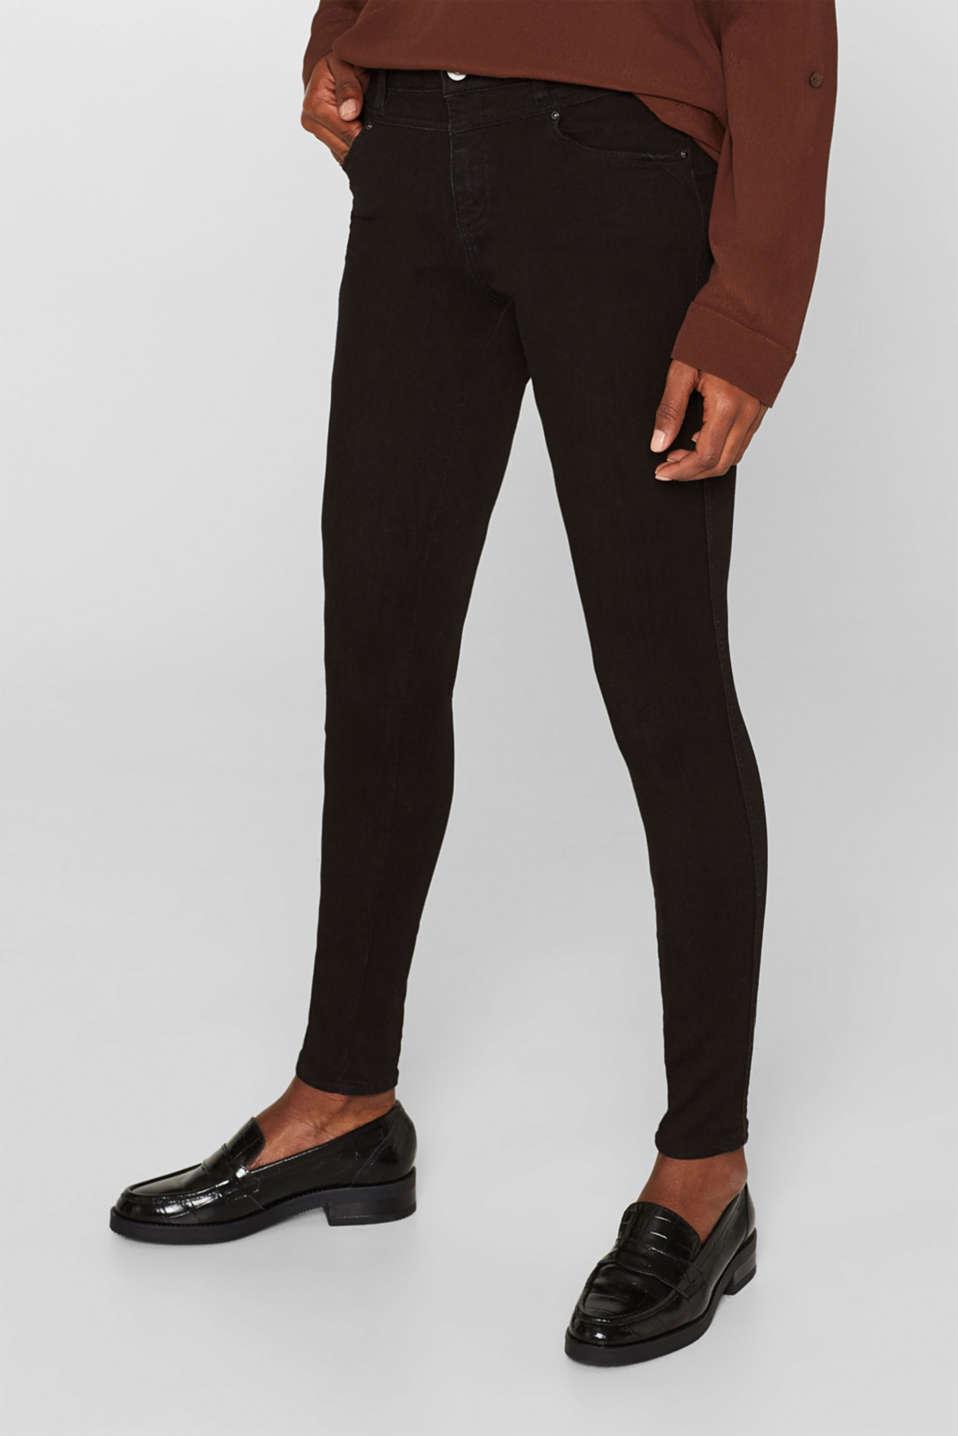 Pants denim, BLACK RINSE, detail image number 7